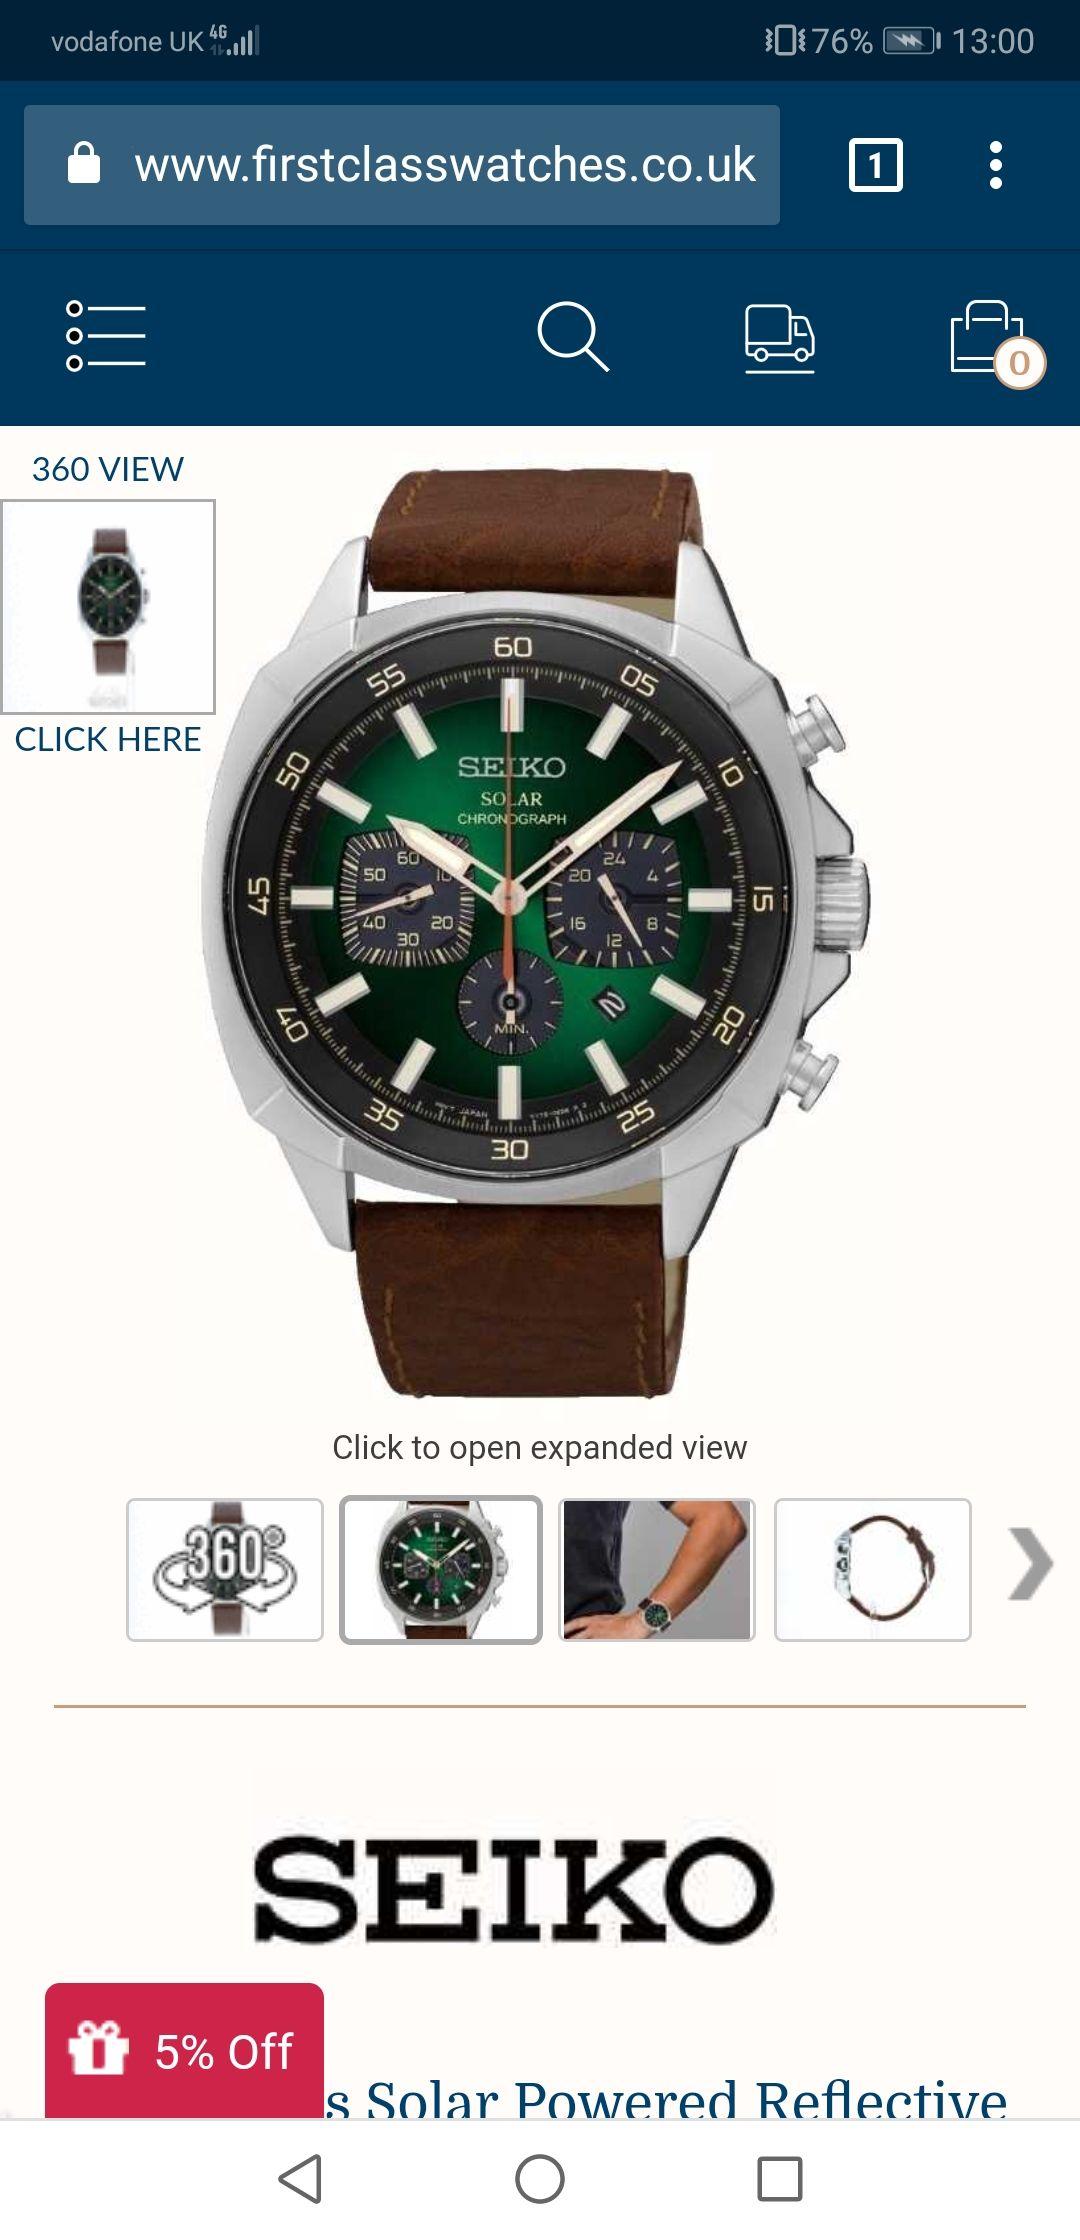 Seiko solar watch £188.32 @ First class watches